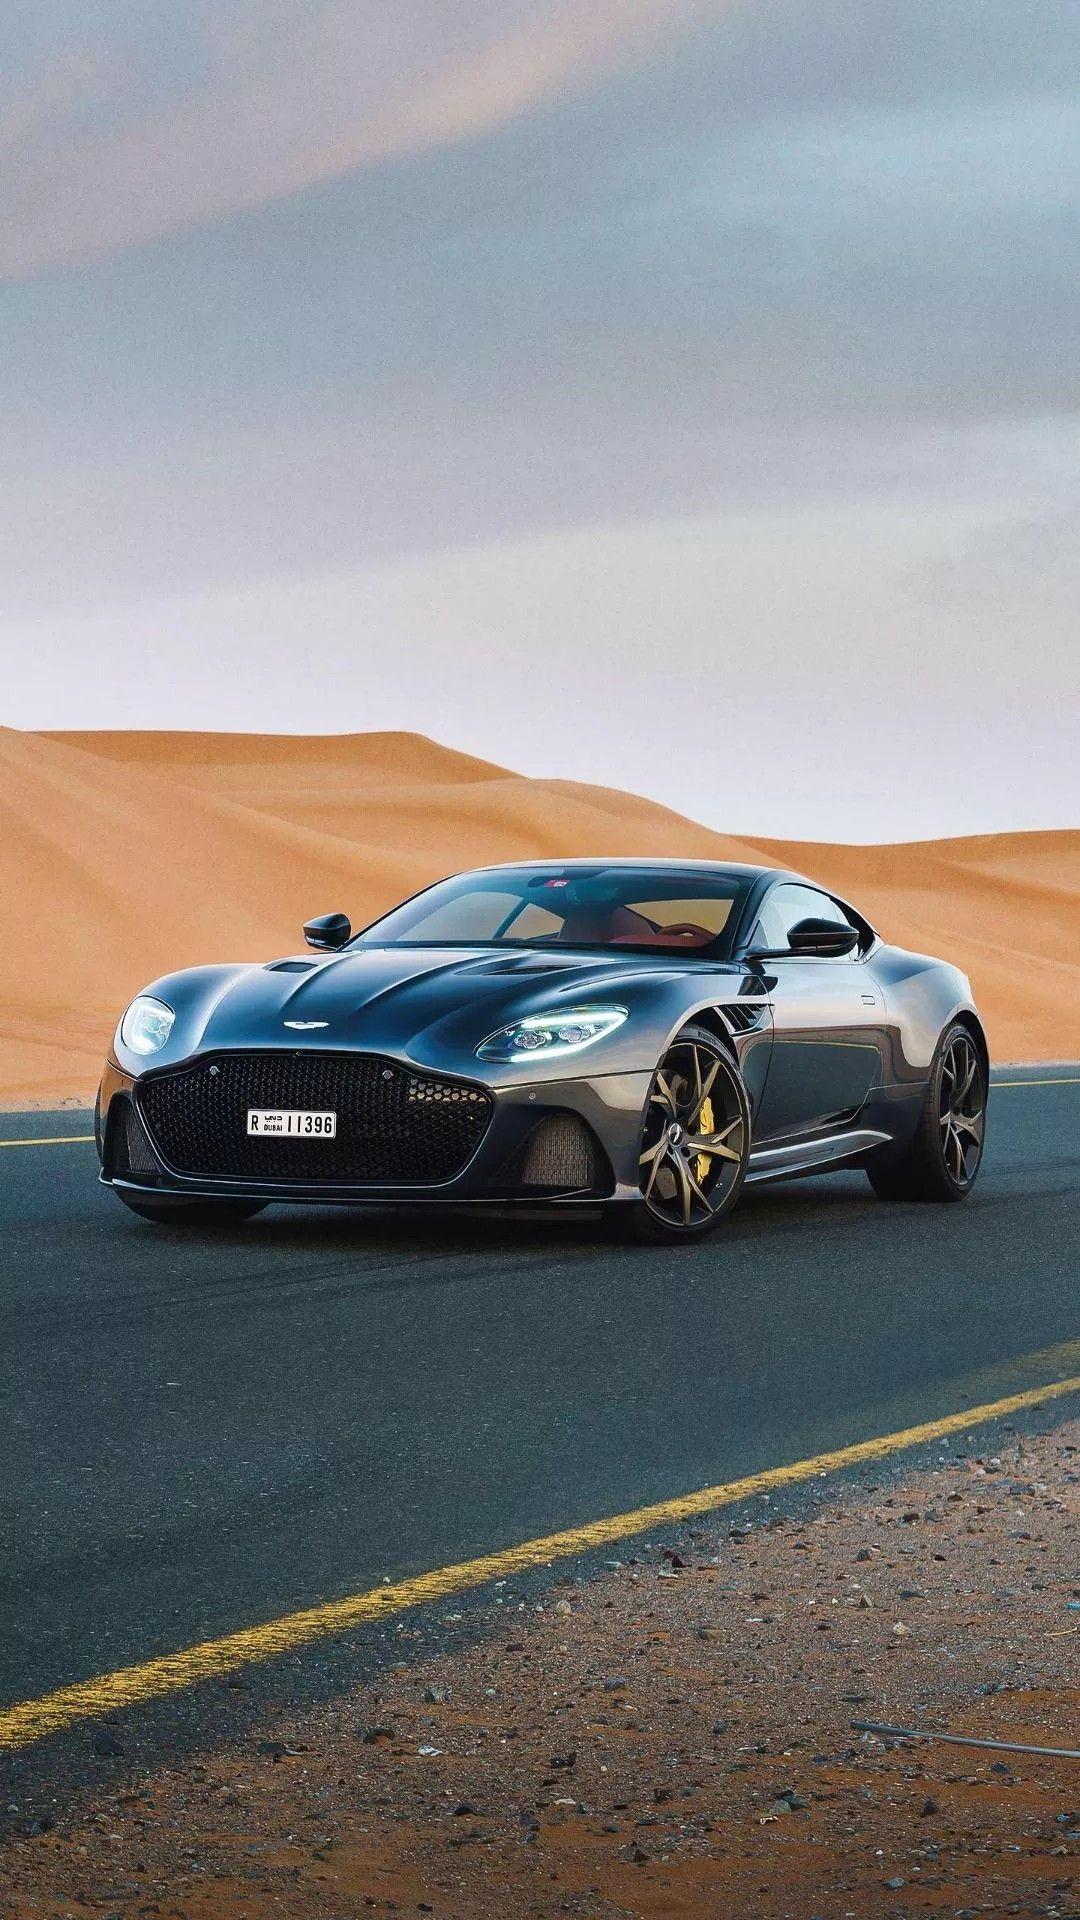 Aston Martin Aston Martin Sports Cars Luxury Sport Cars